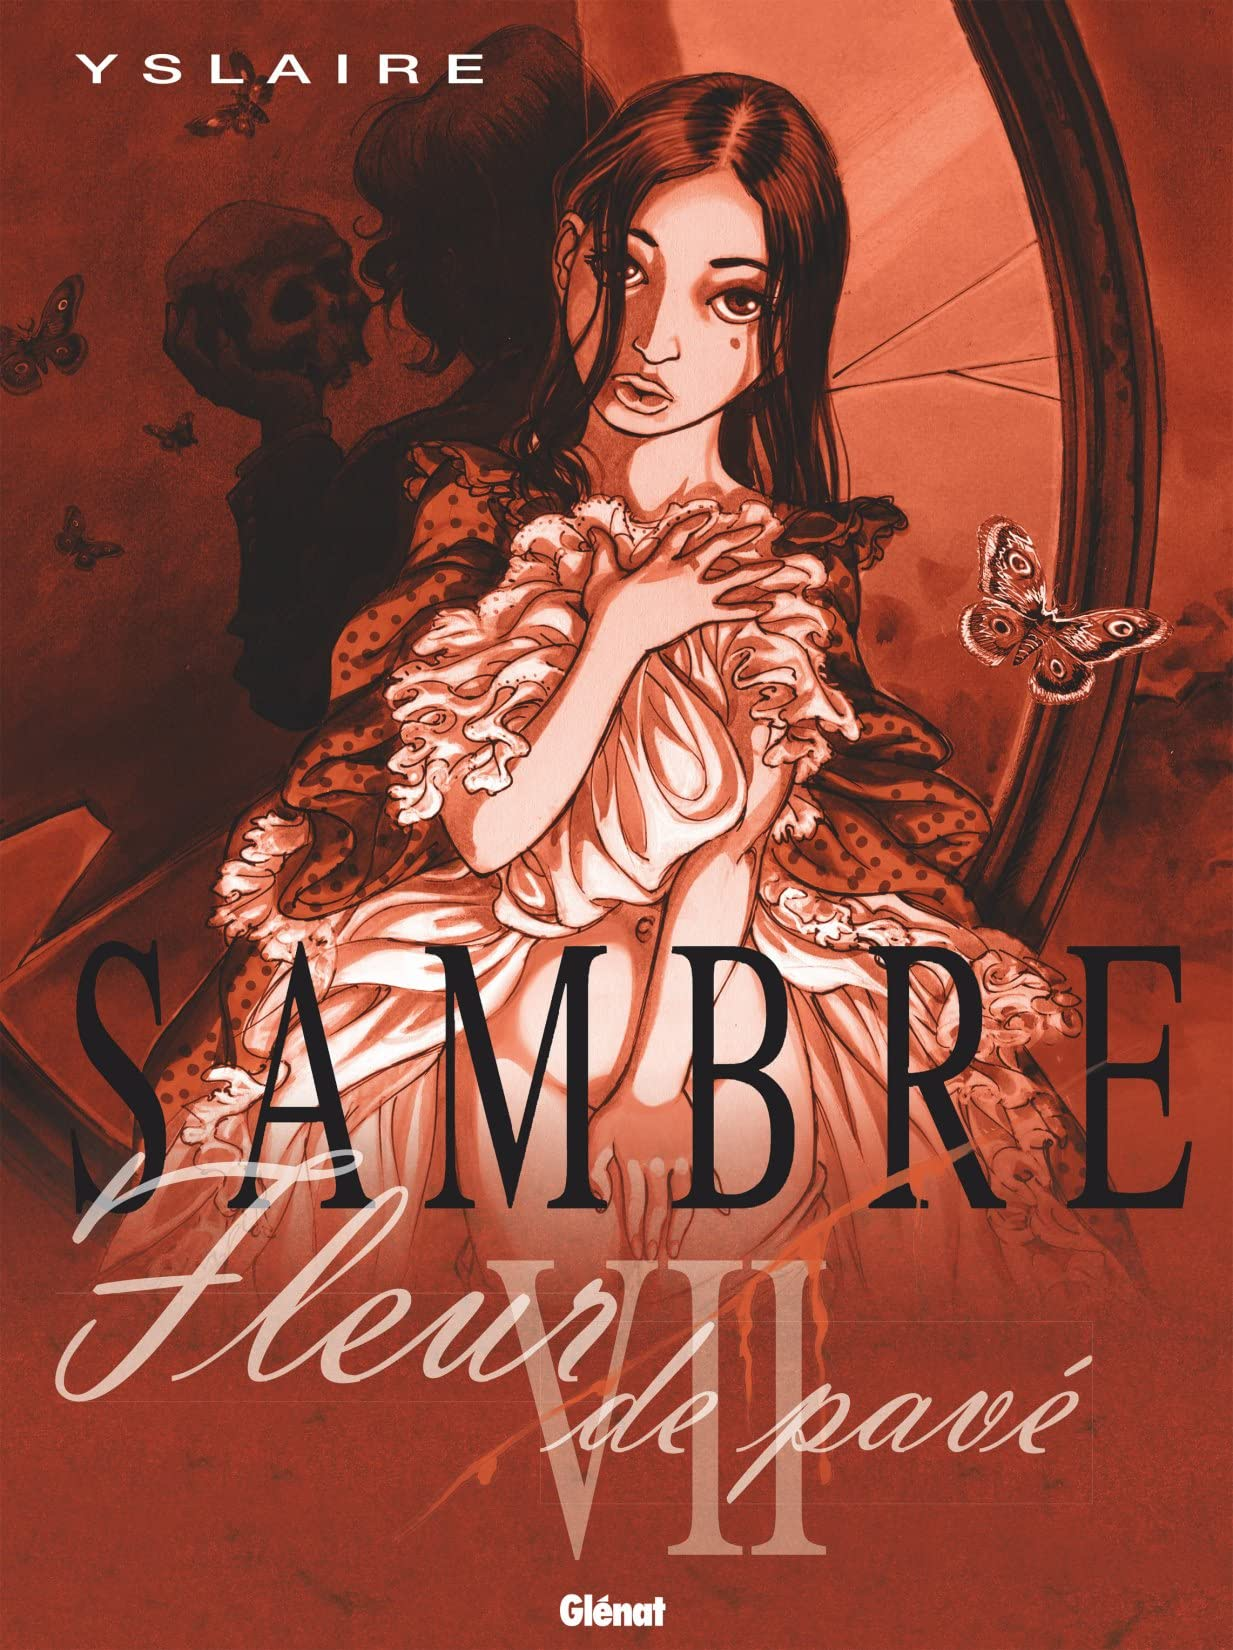 Sambre Vol. 7: Fleur de pavé